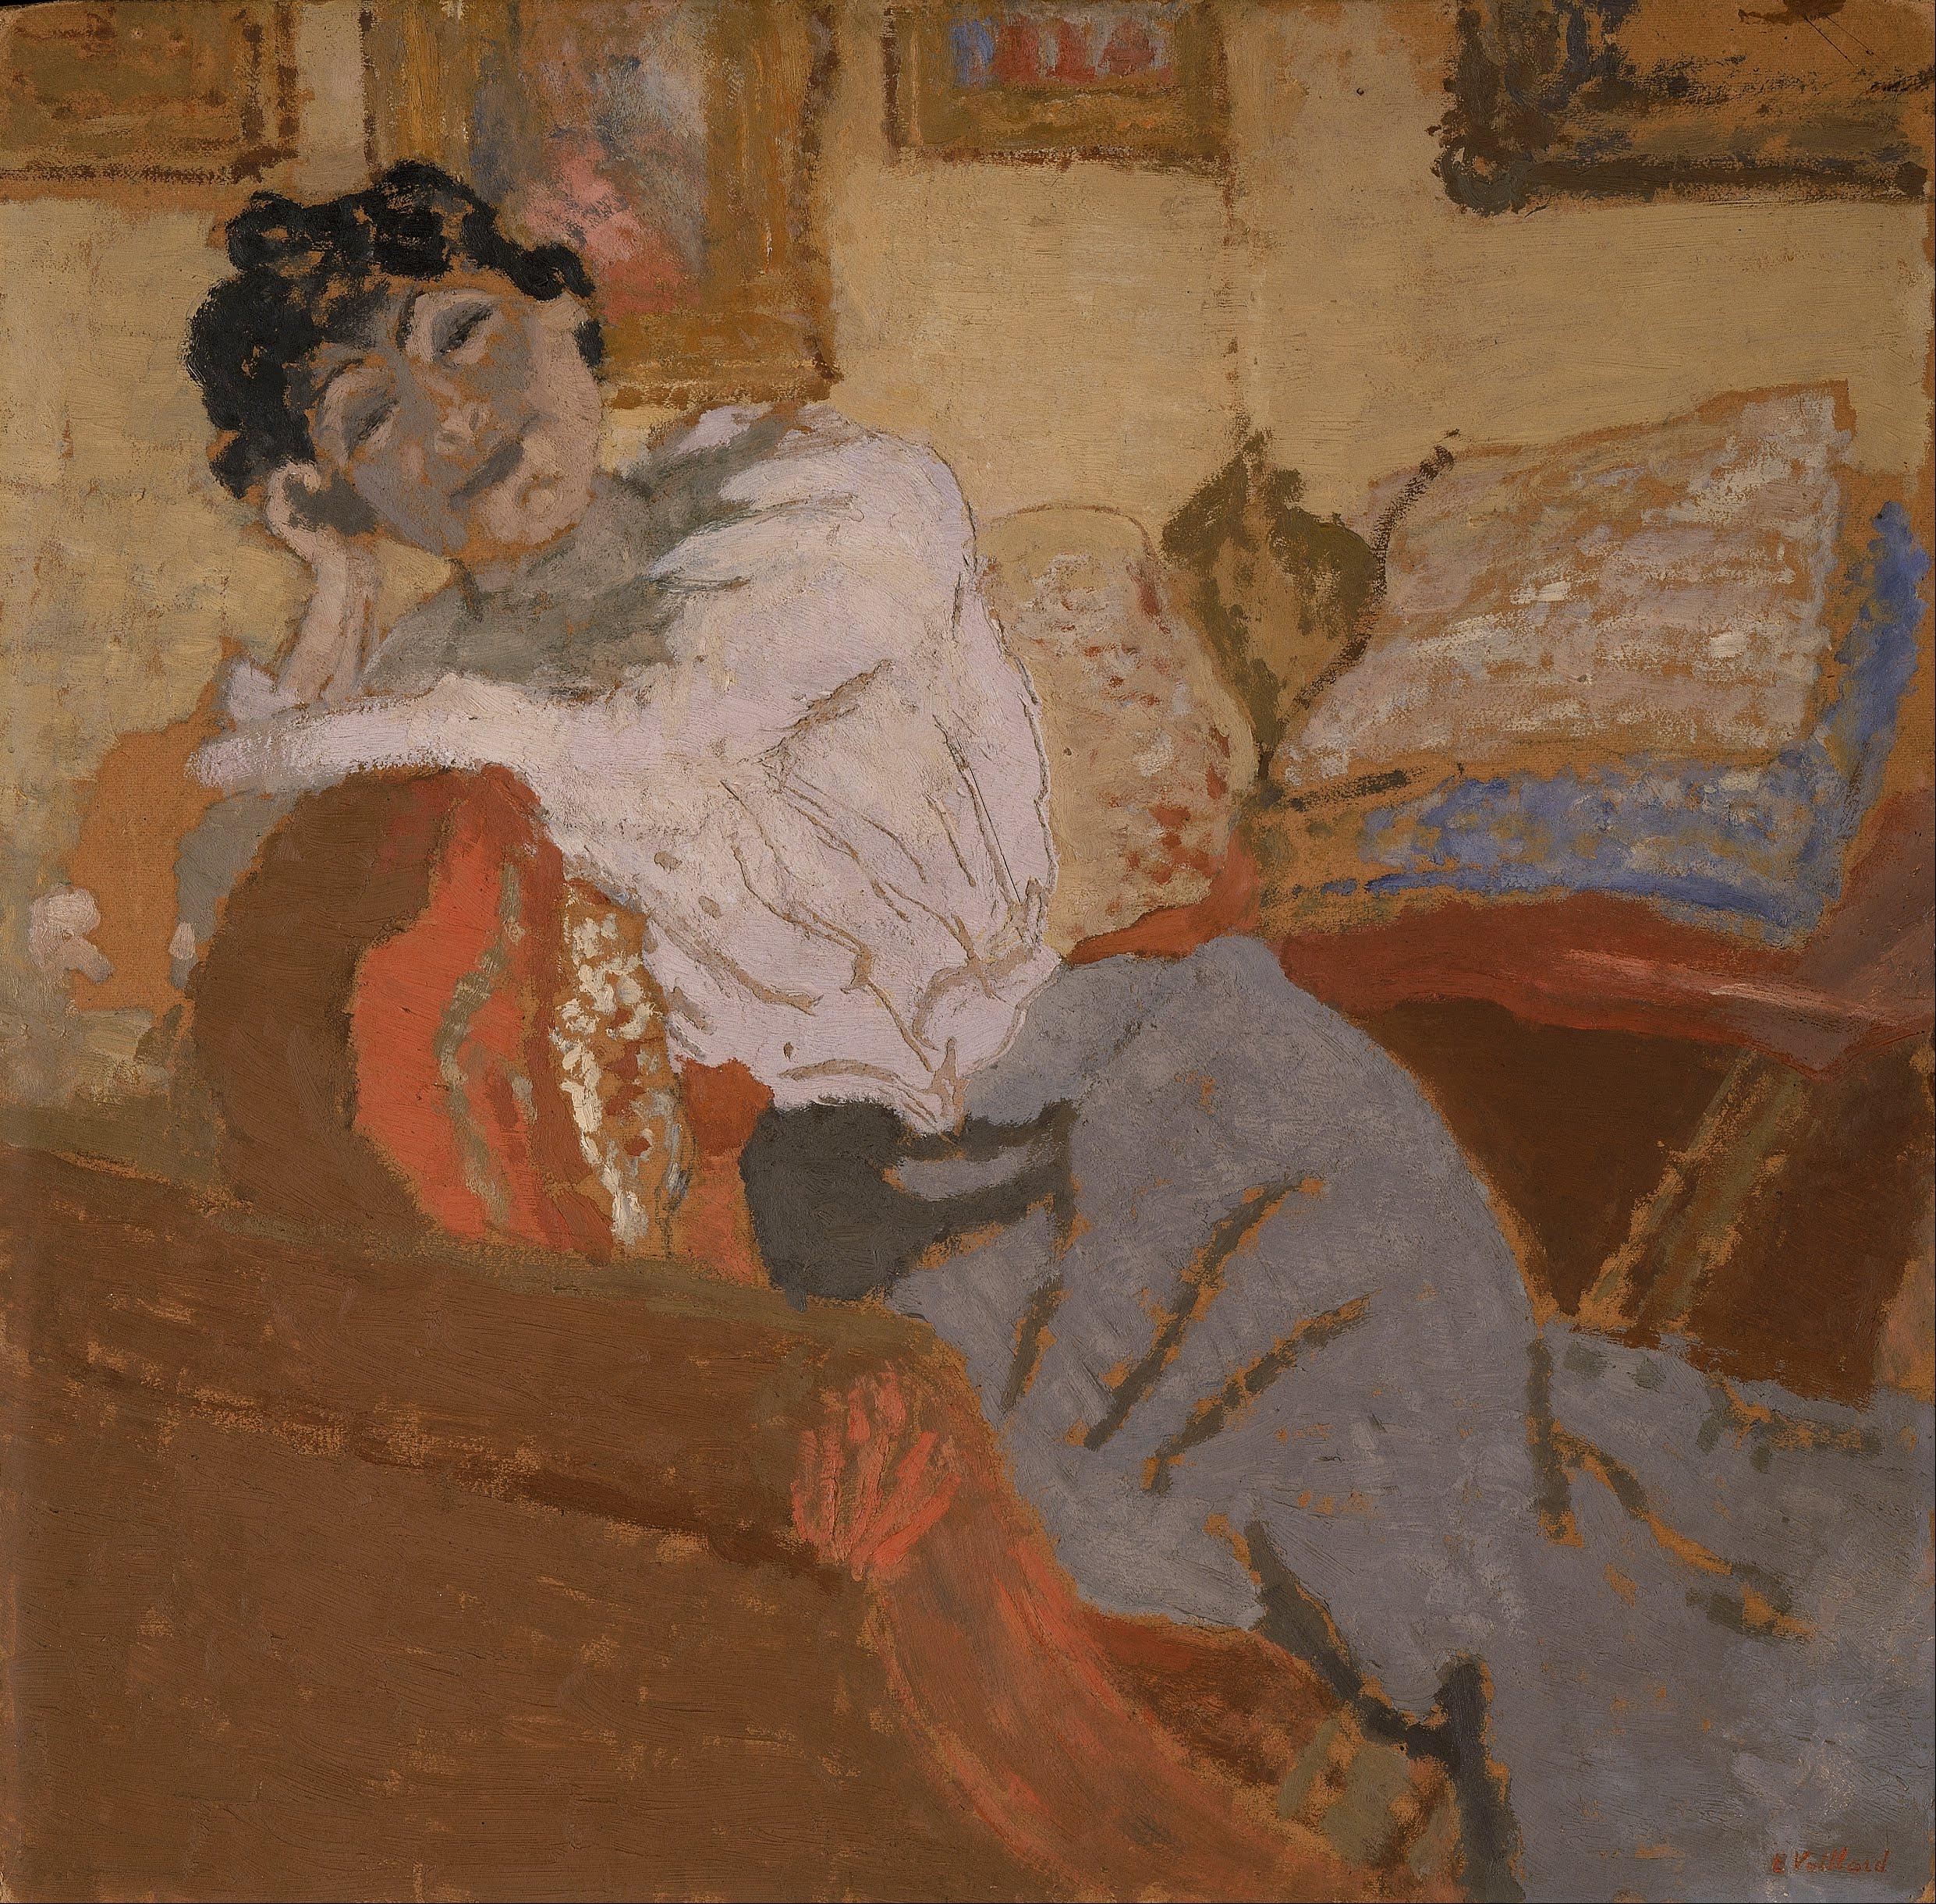 Édouard Vuillard, Madame Hessel au Sofa (Madame Hessel on the Sofa)